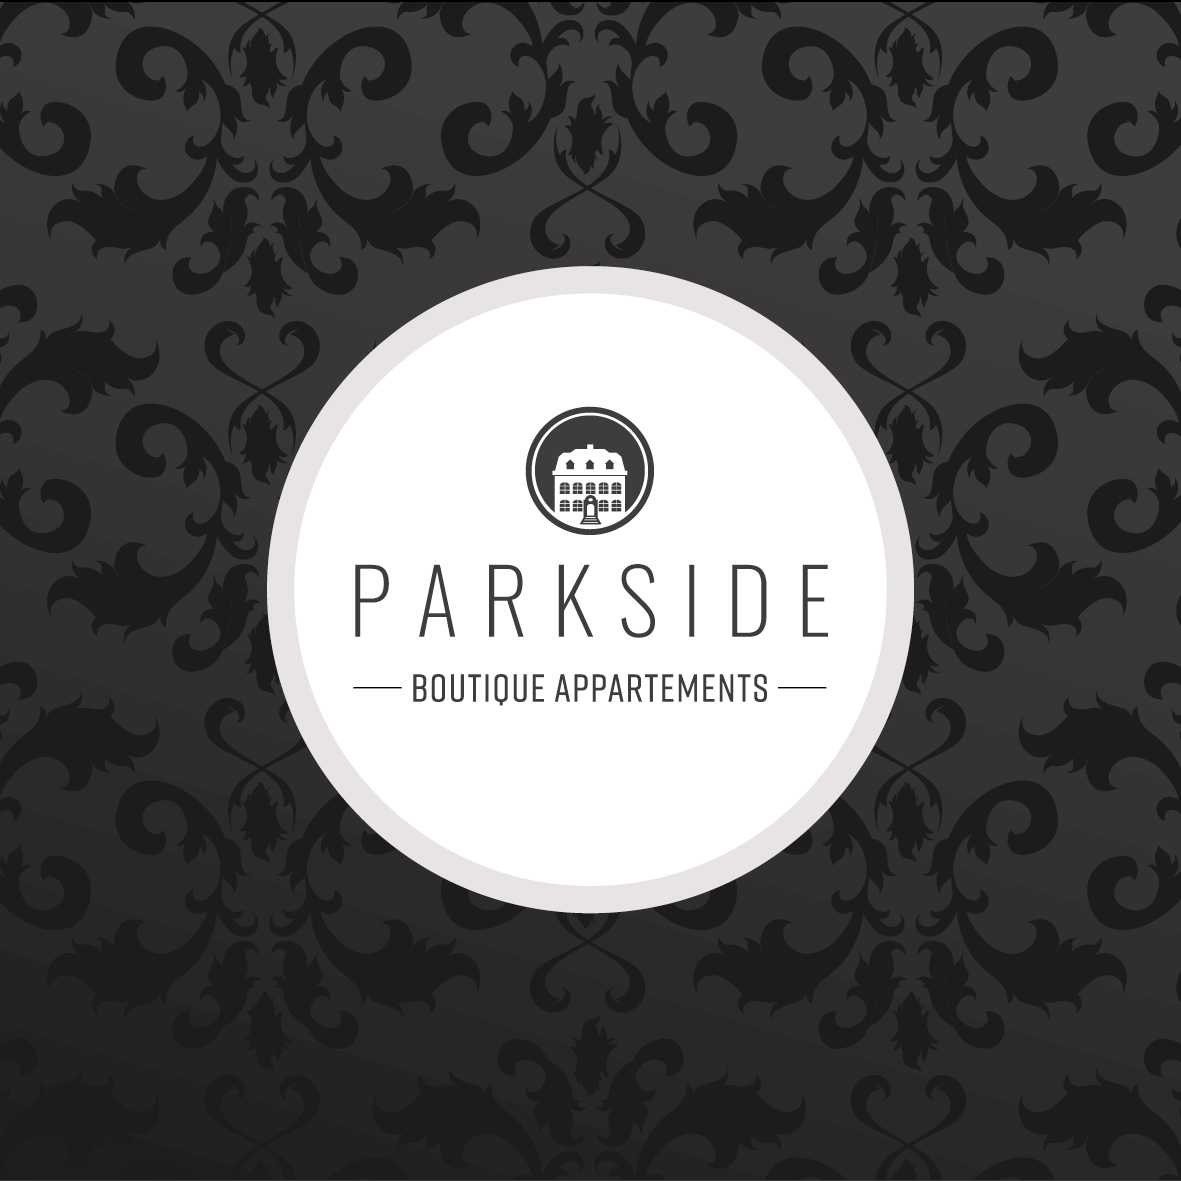 Corporate Design & Brand PARKSIDE Boutique Appartements